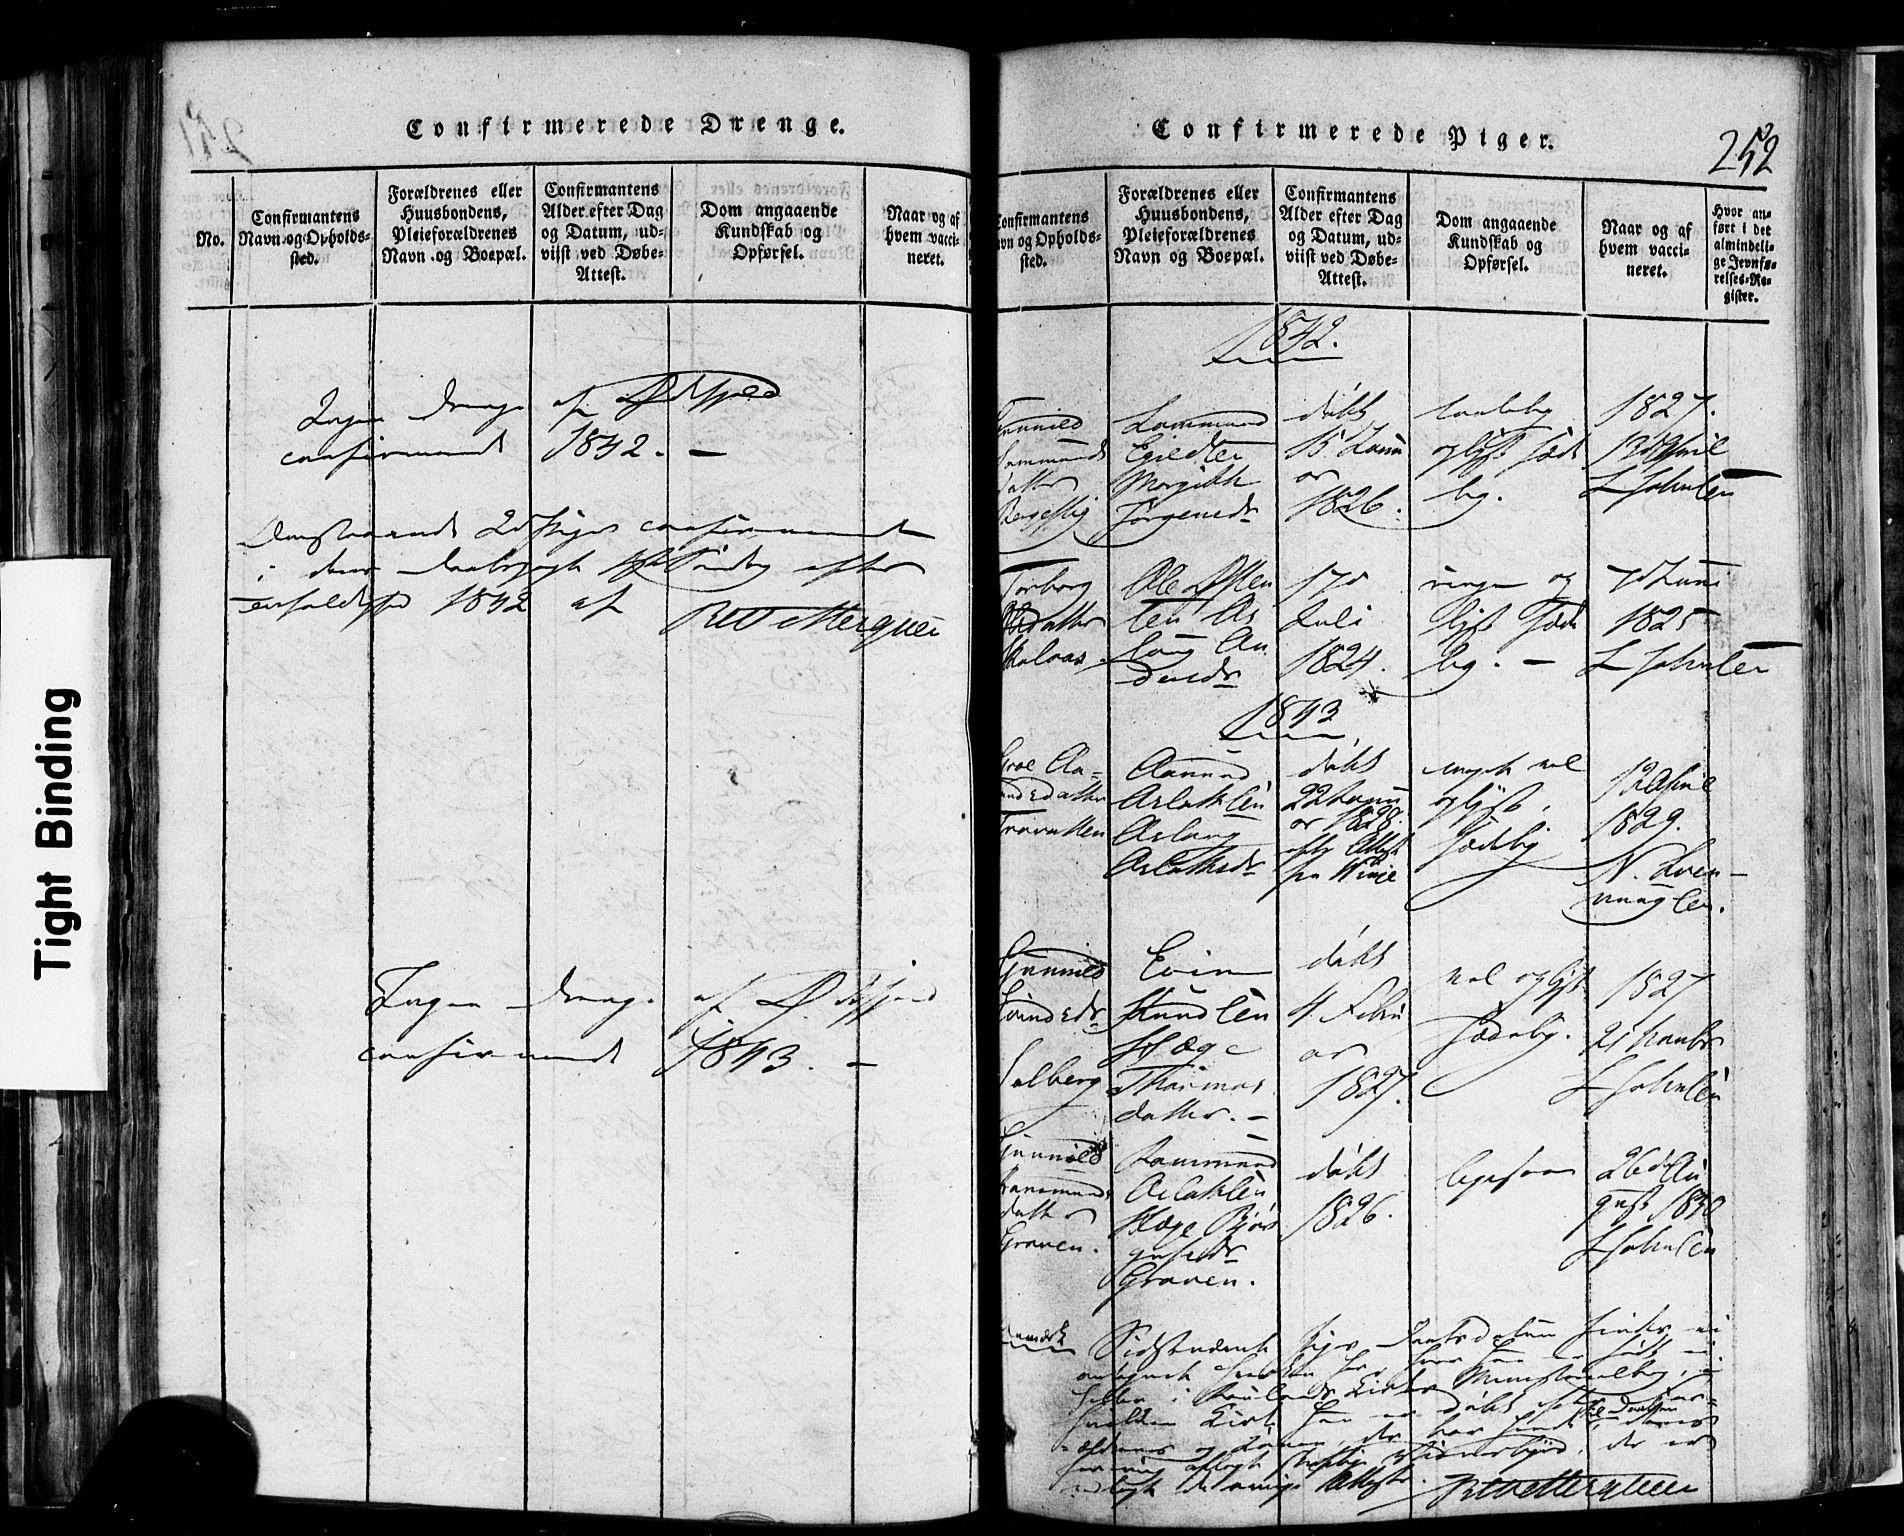 SAKO, Rauland kirkebøker, F/Fa/L0002: Ministerialbok nr. 2, 1815-1860, s. 252